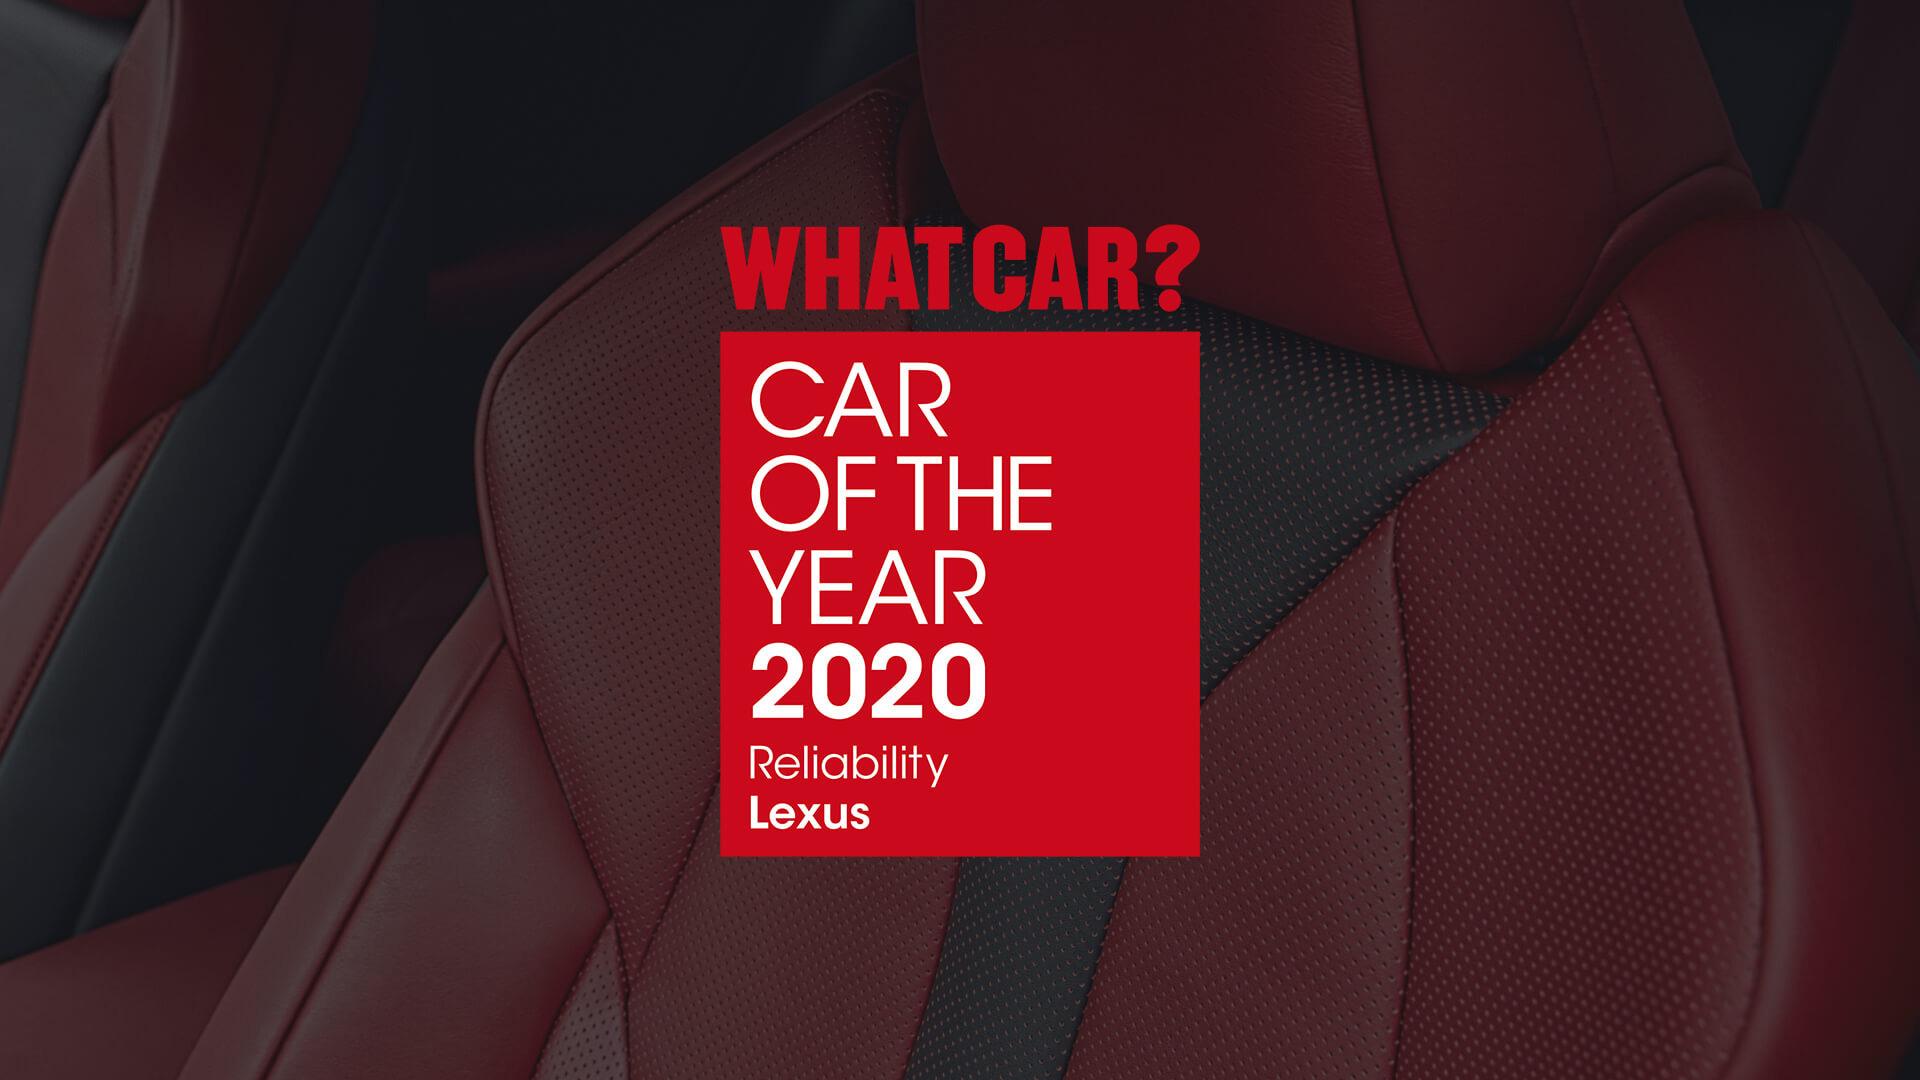 lexus guveni̇li̇rli̇kte bi̇r kez daha zi̇rvede yer aldi